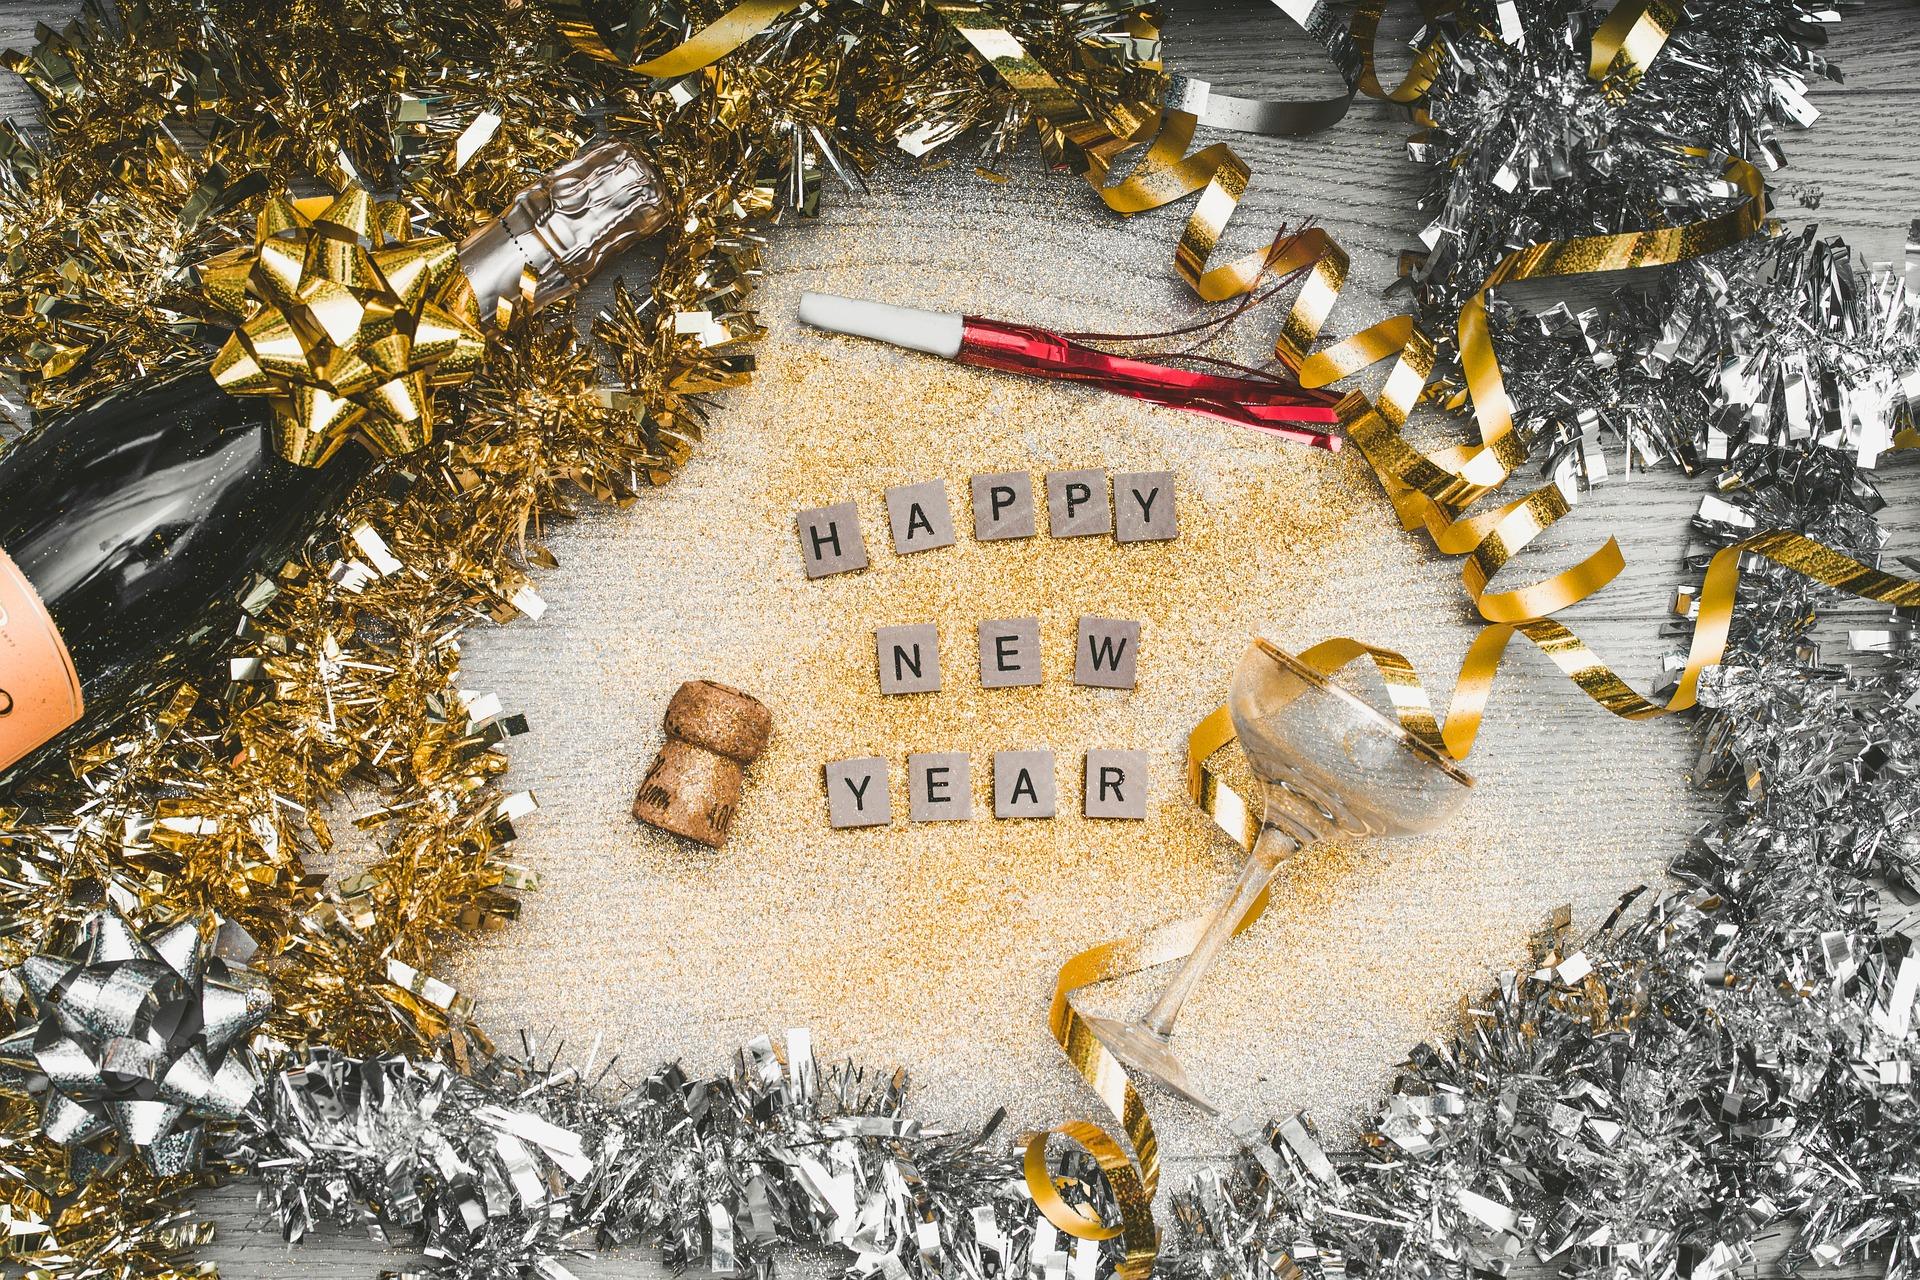 happy-new-year-3050088_1920.jpg